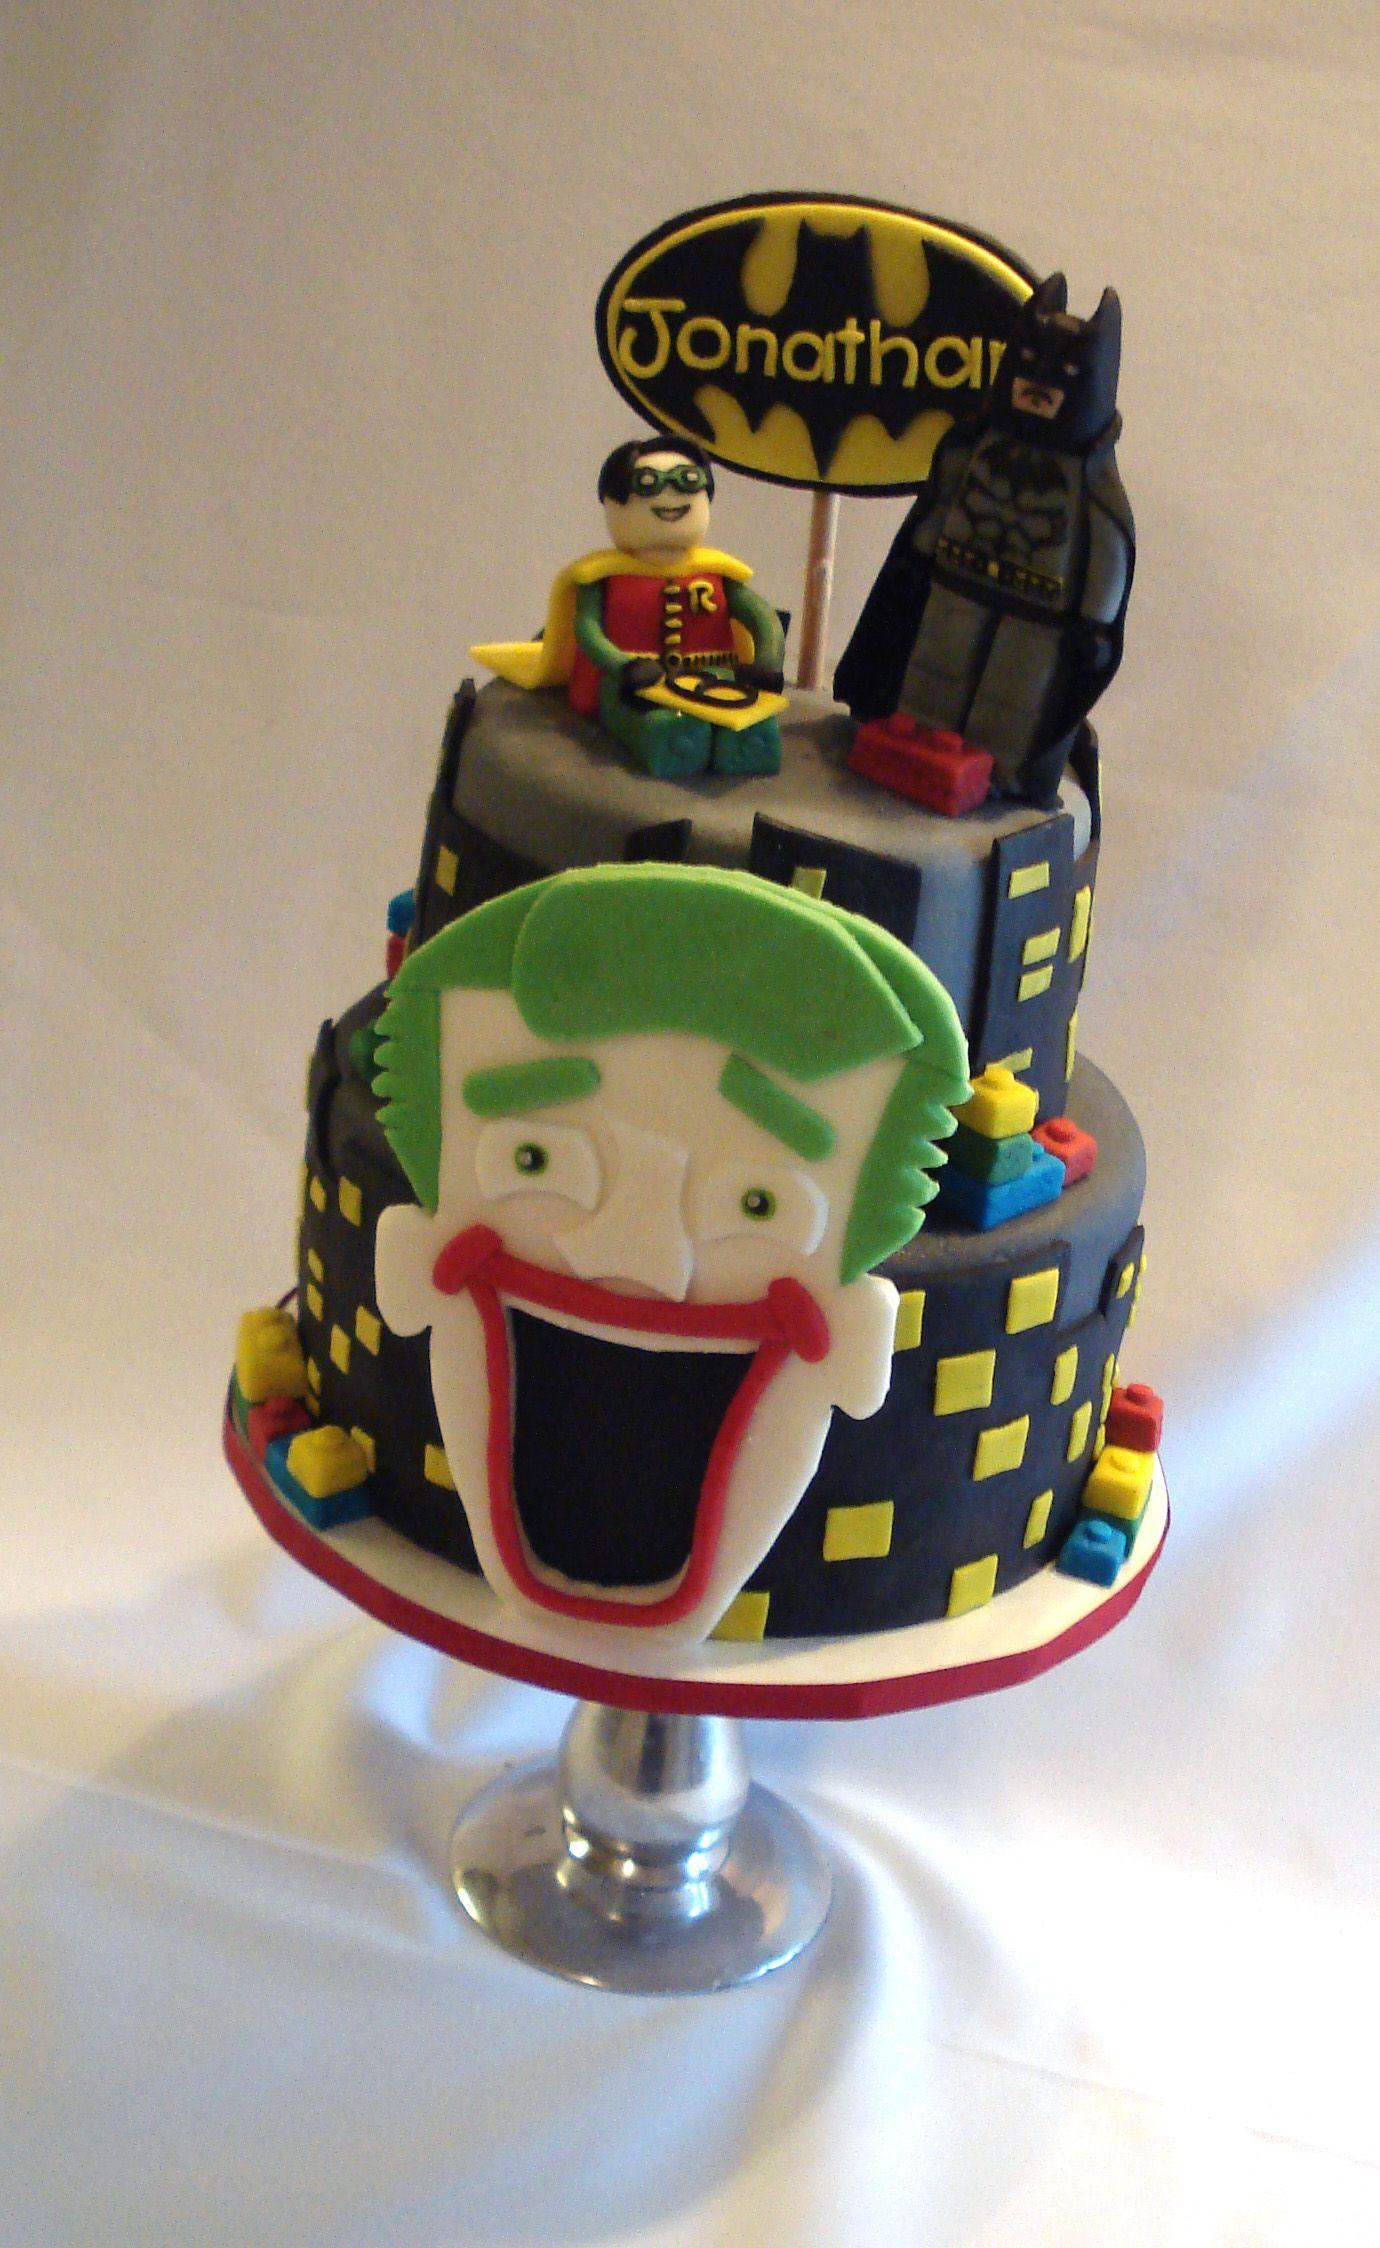 Lego batman Inspired cake All fondant cake with fondant figures and